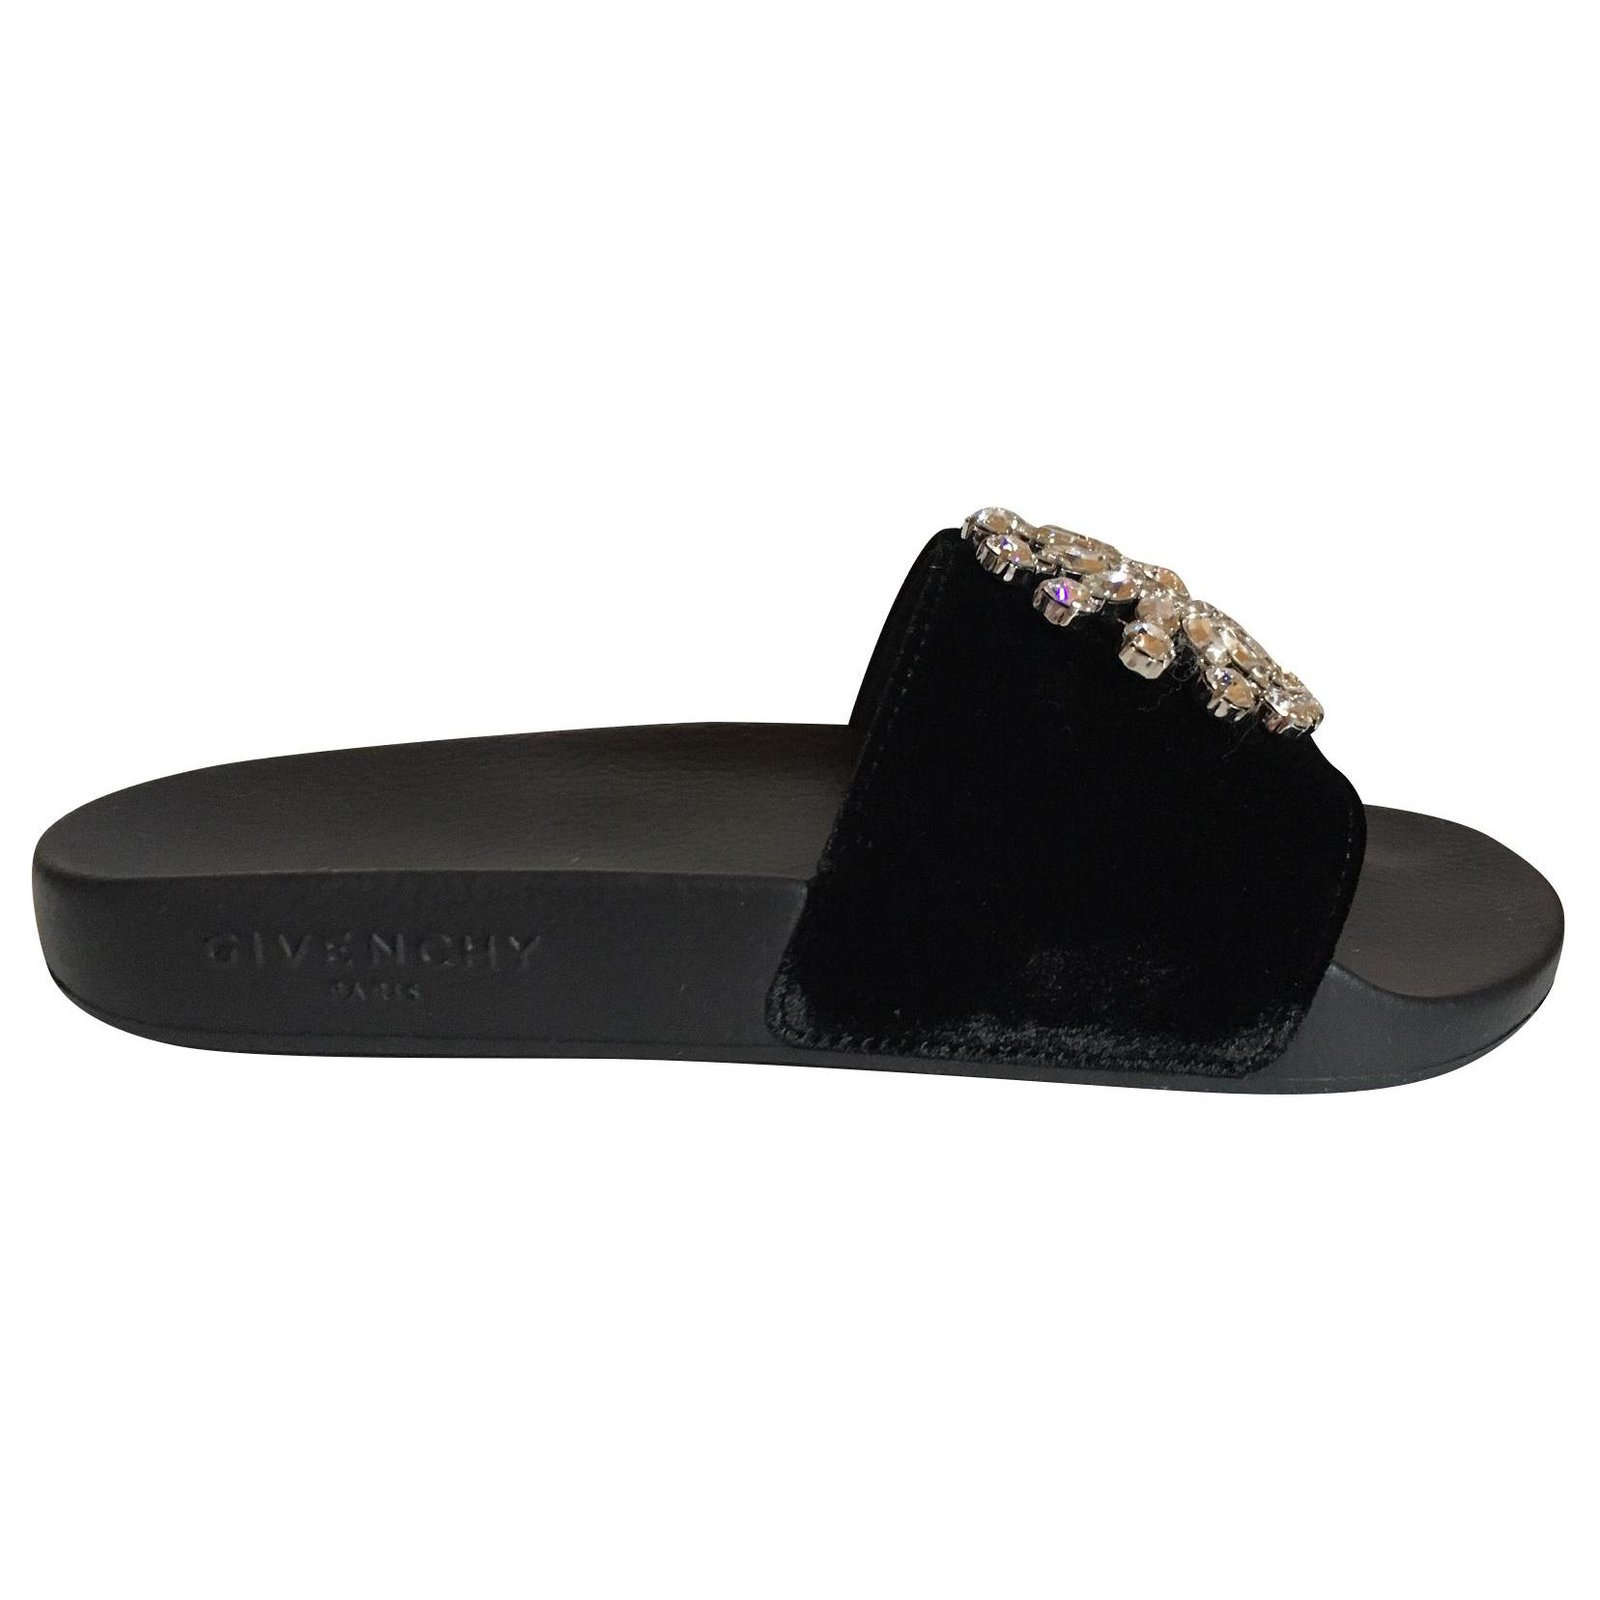 8de3958bdab3 Givenchy slide Sandals Leather Black ref.123019 - Joli Closet